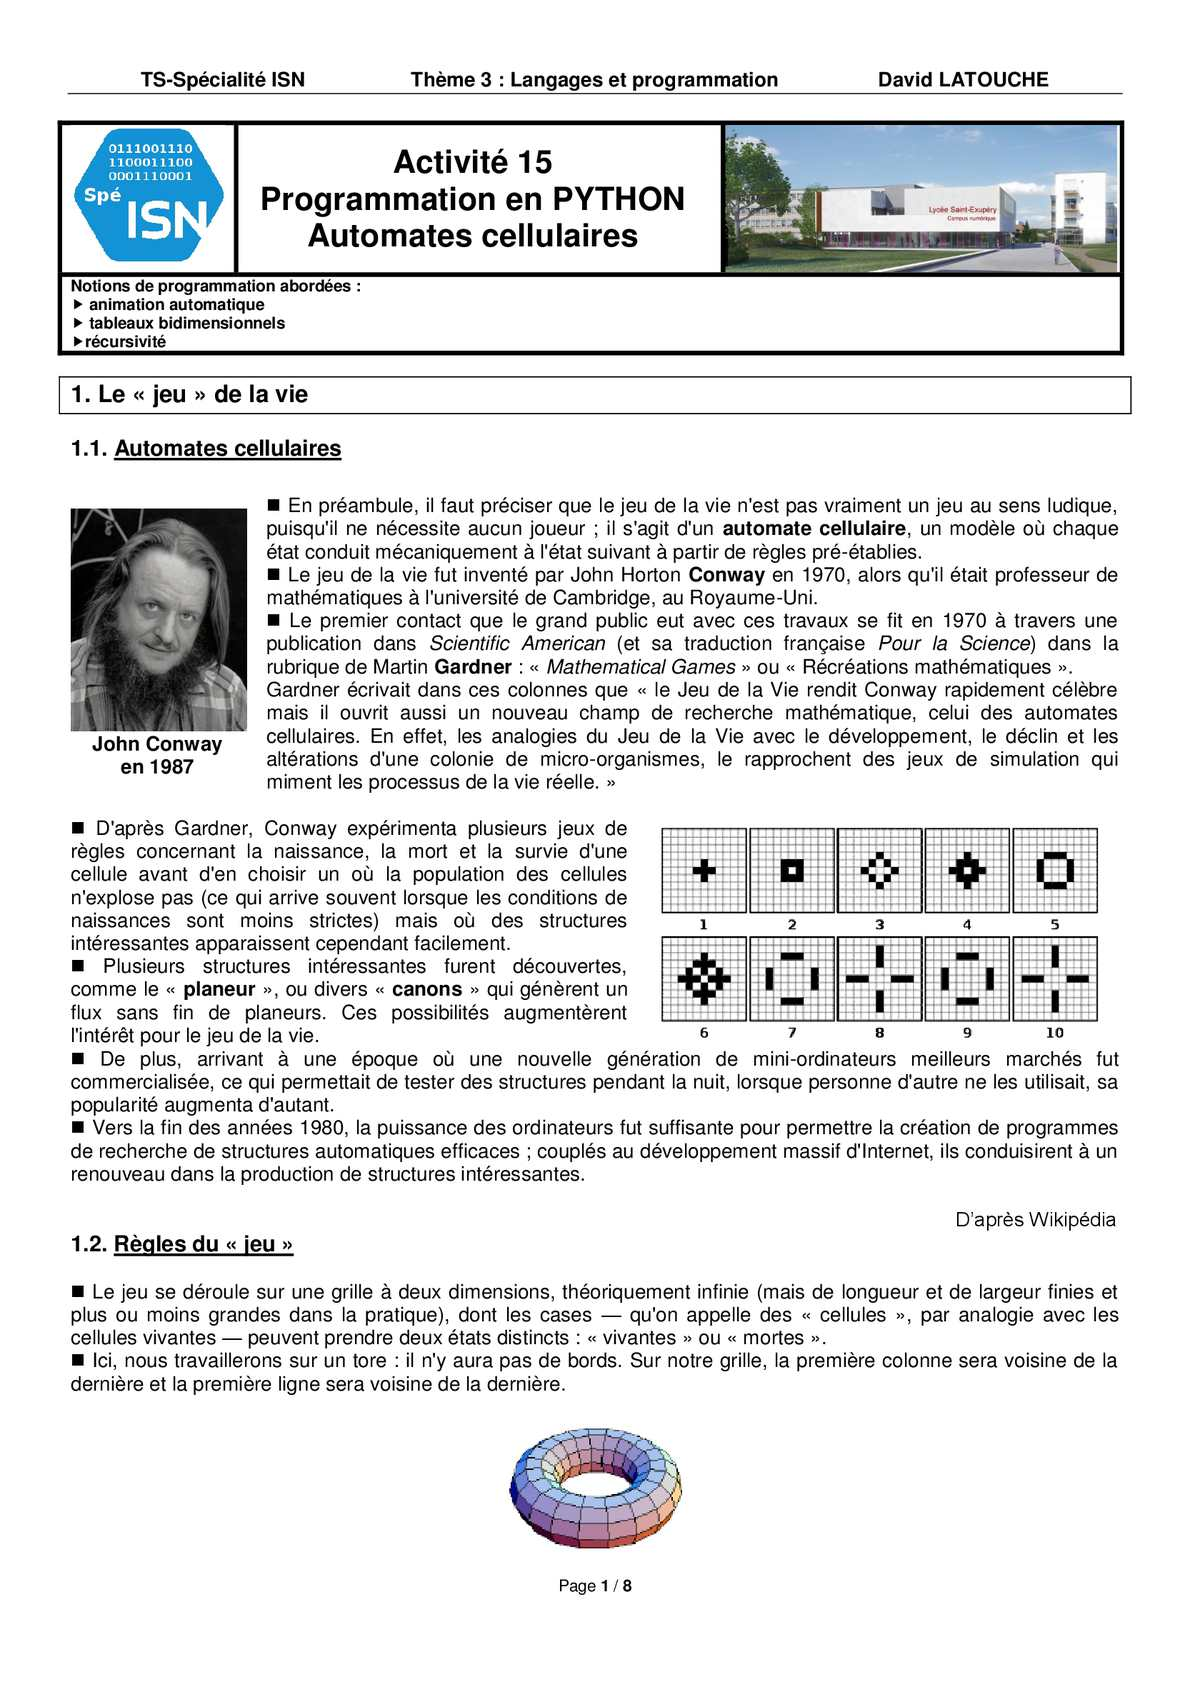 A15_ISN_Automates_Cellulaires